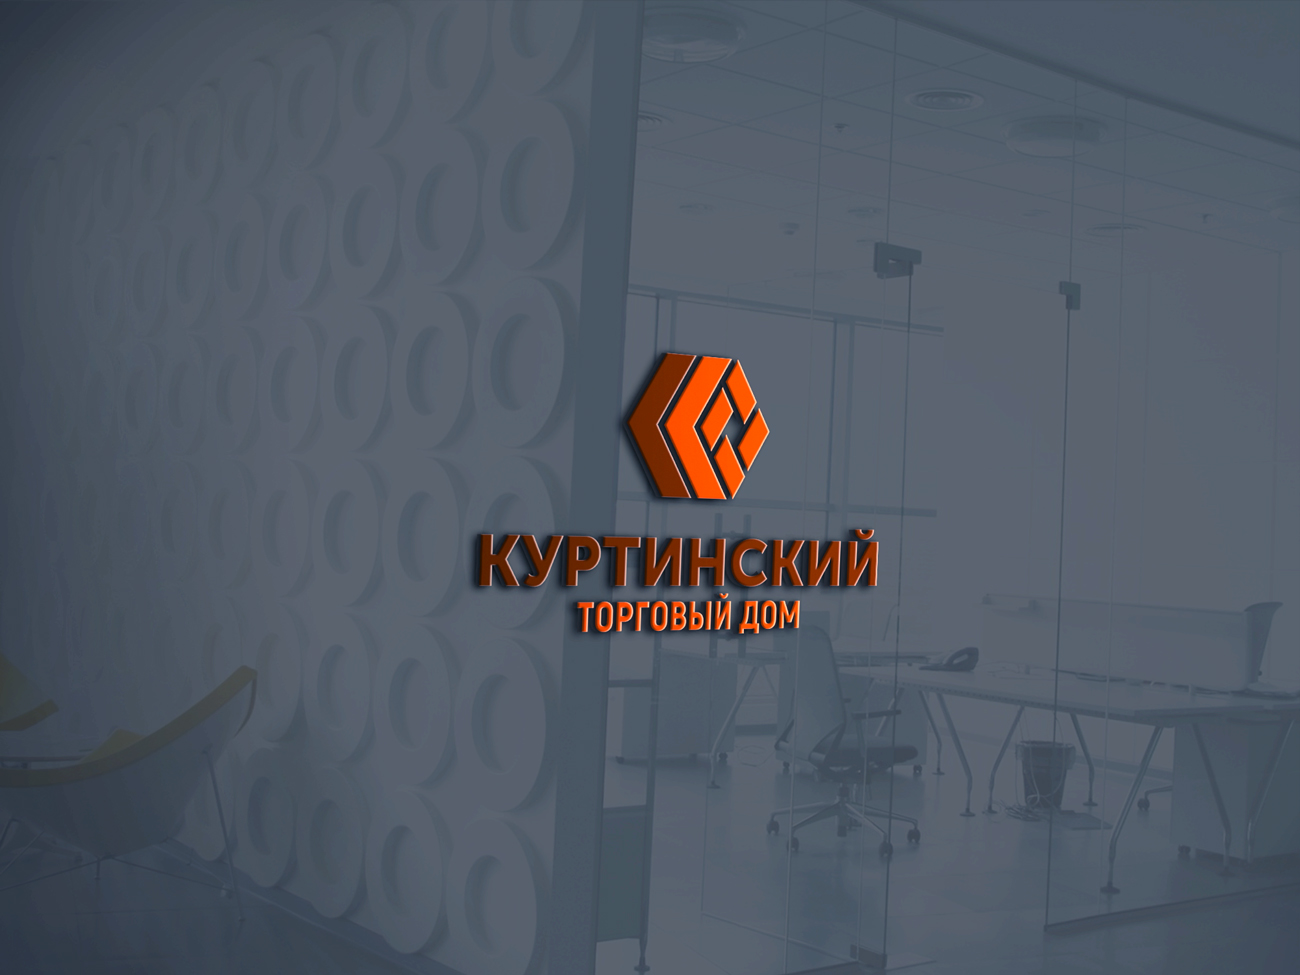 Логотип для камнедобывающей компании фото f_3765b9fad88cecde.jpg